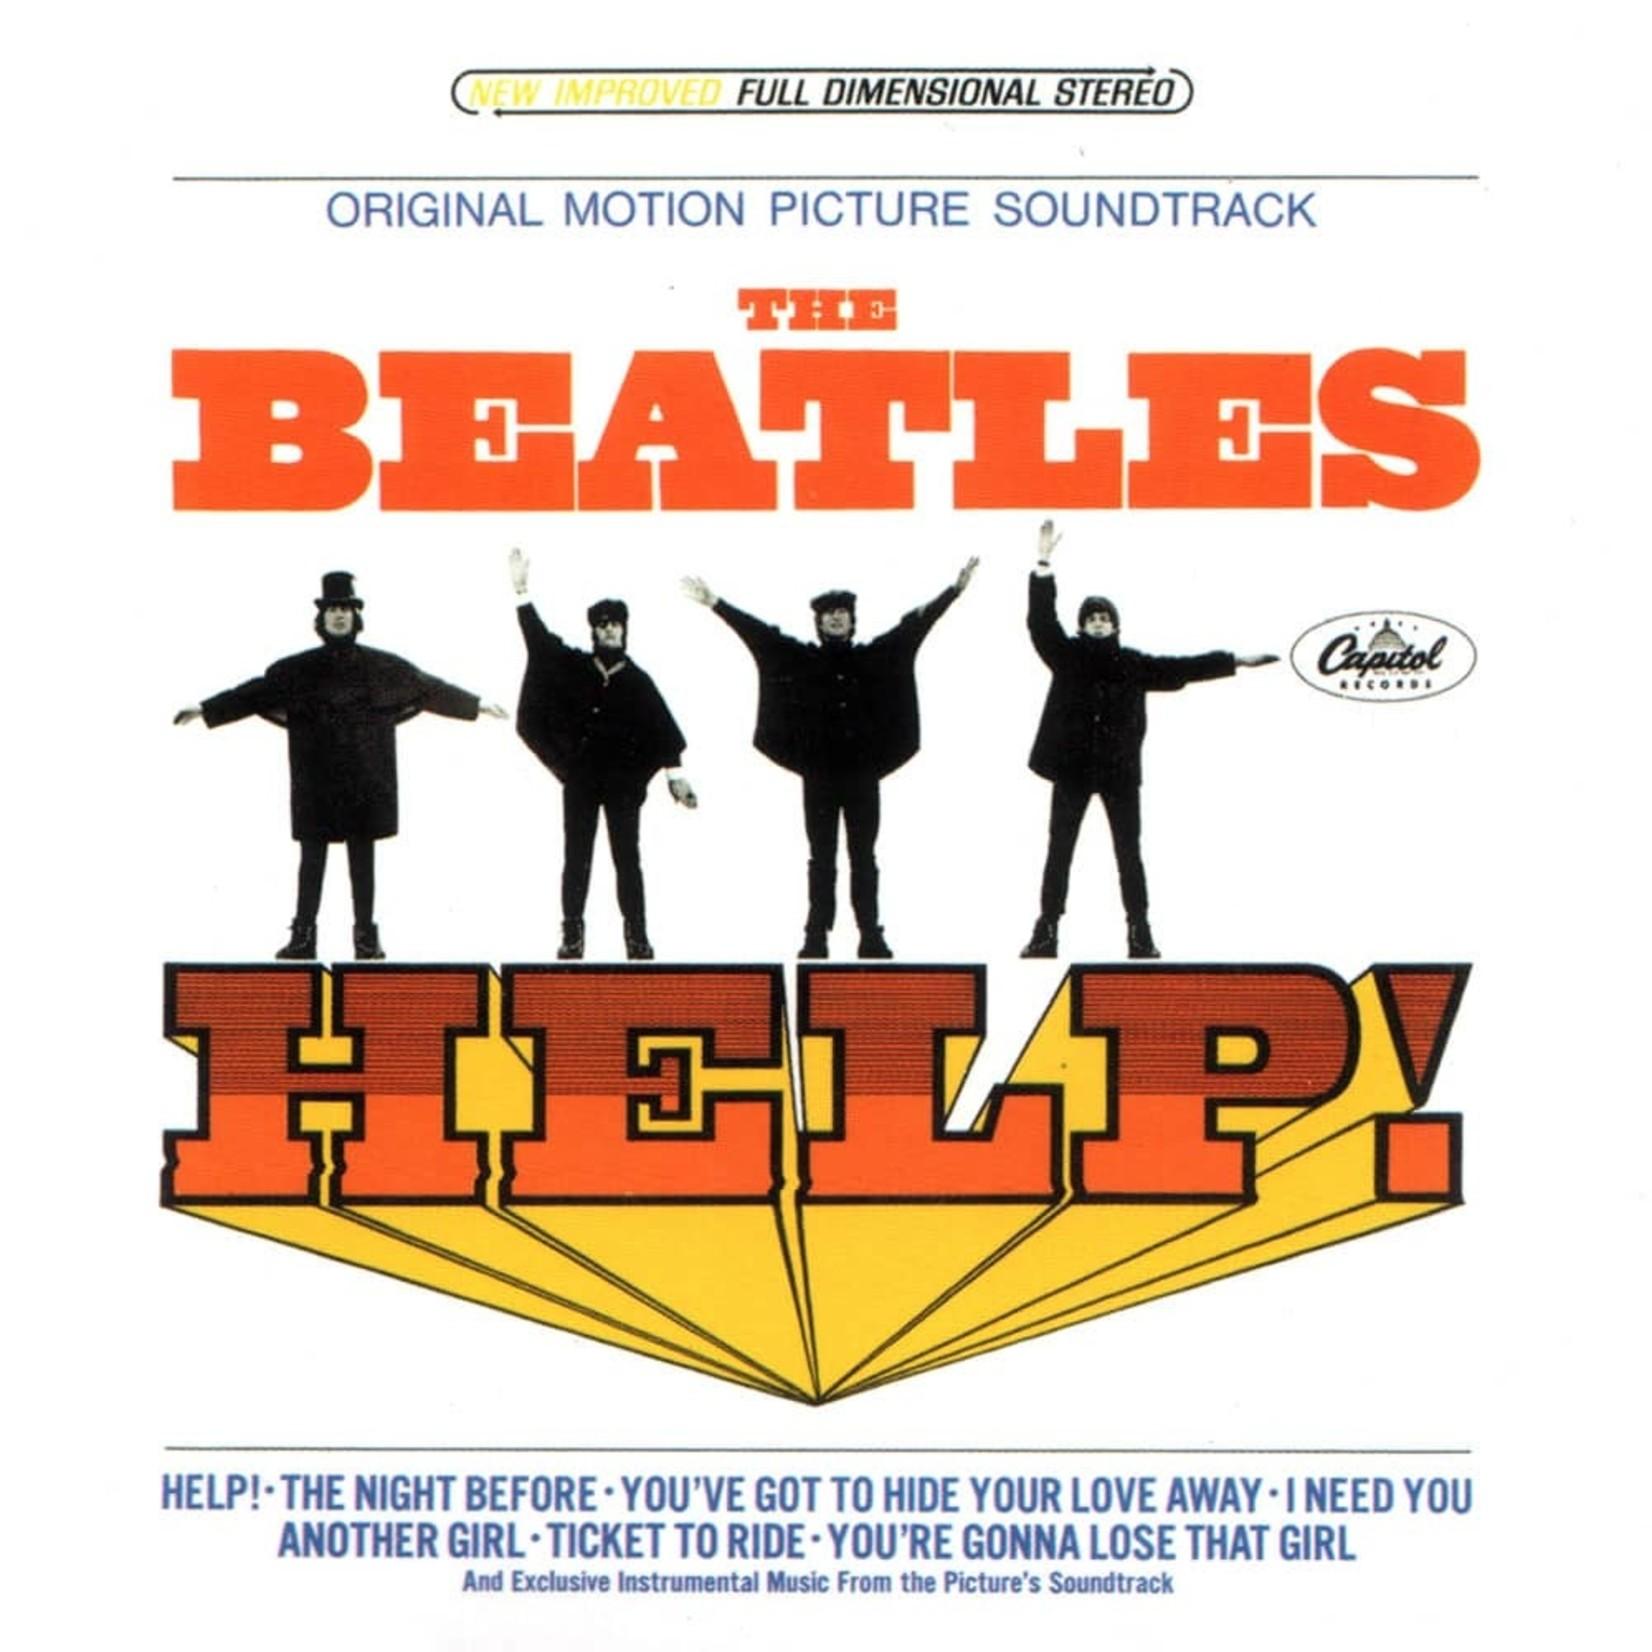 [Vintage] Beatles: Help (motion picture, reissue)